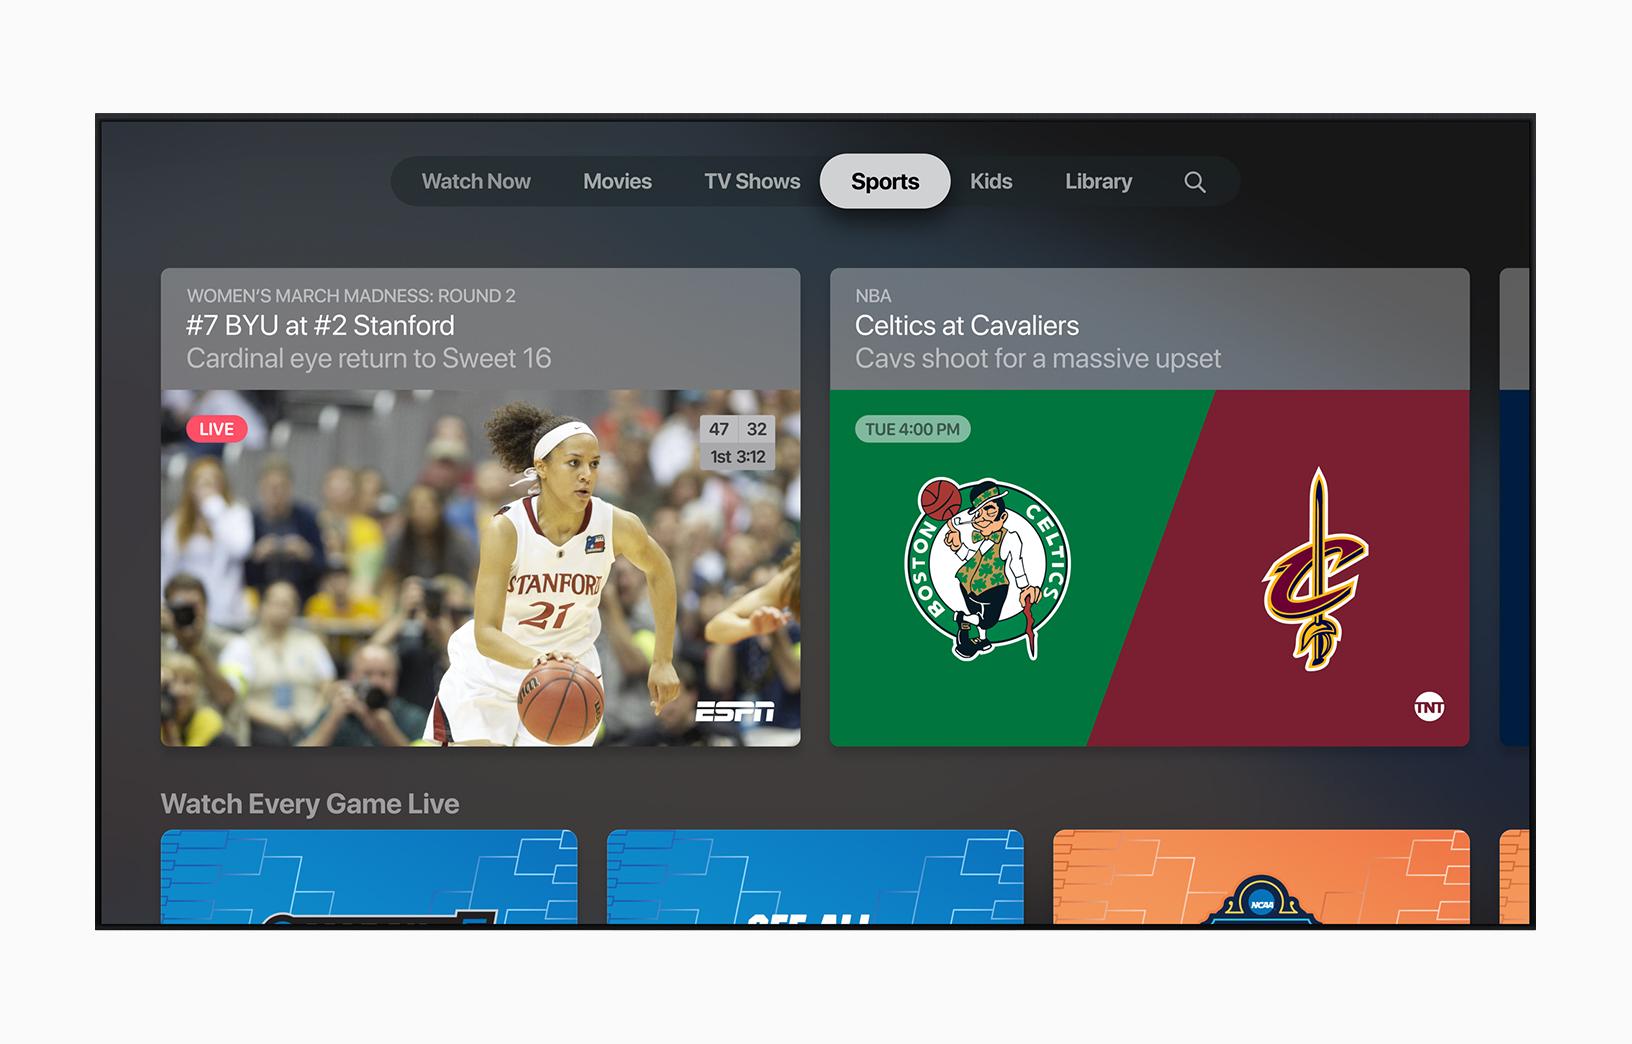 Apple_TV_app_sports-screen_032519.jpg